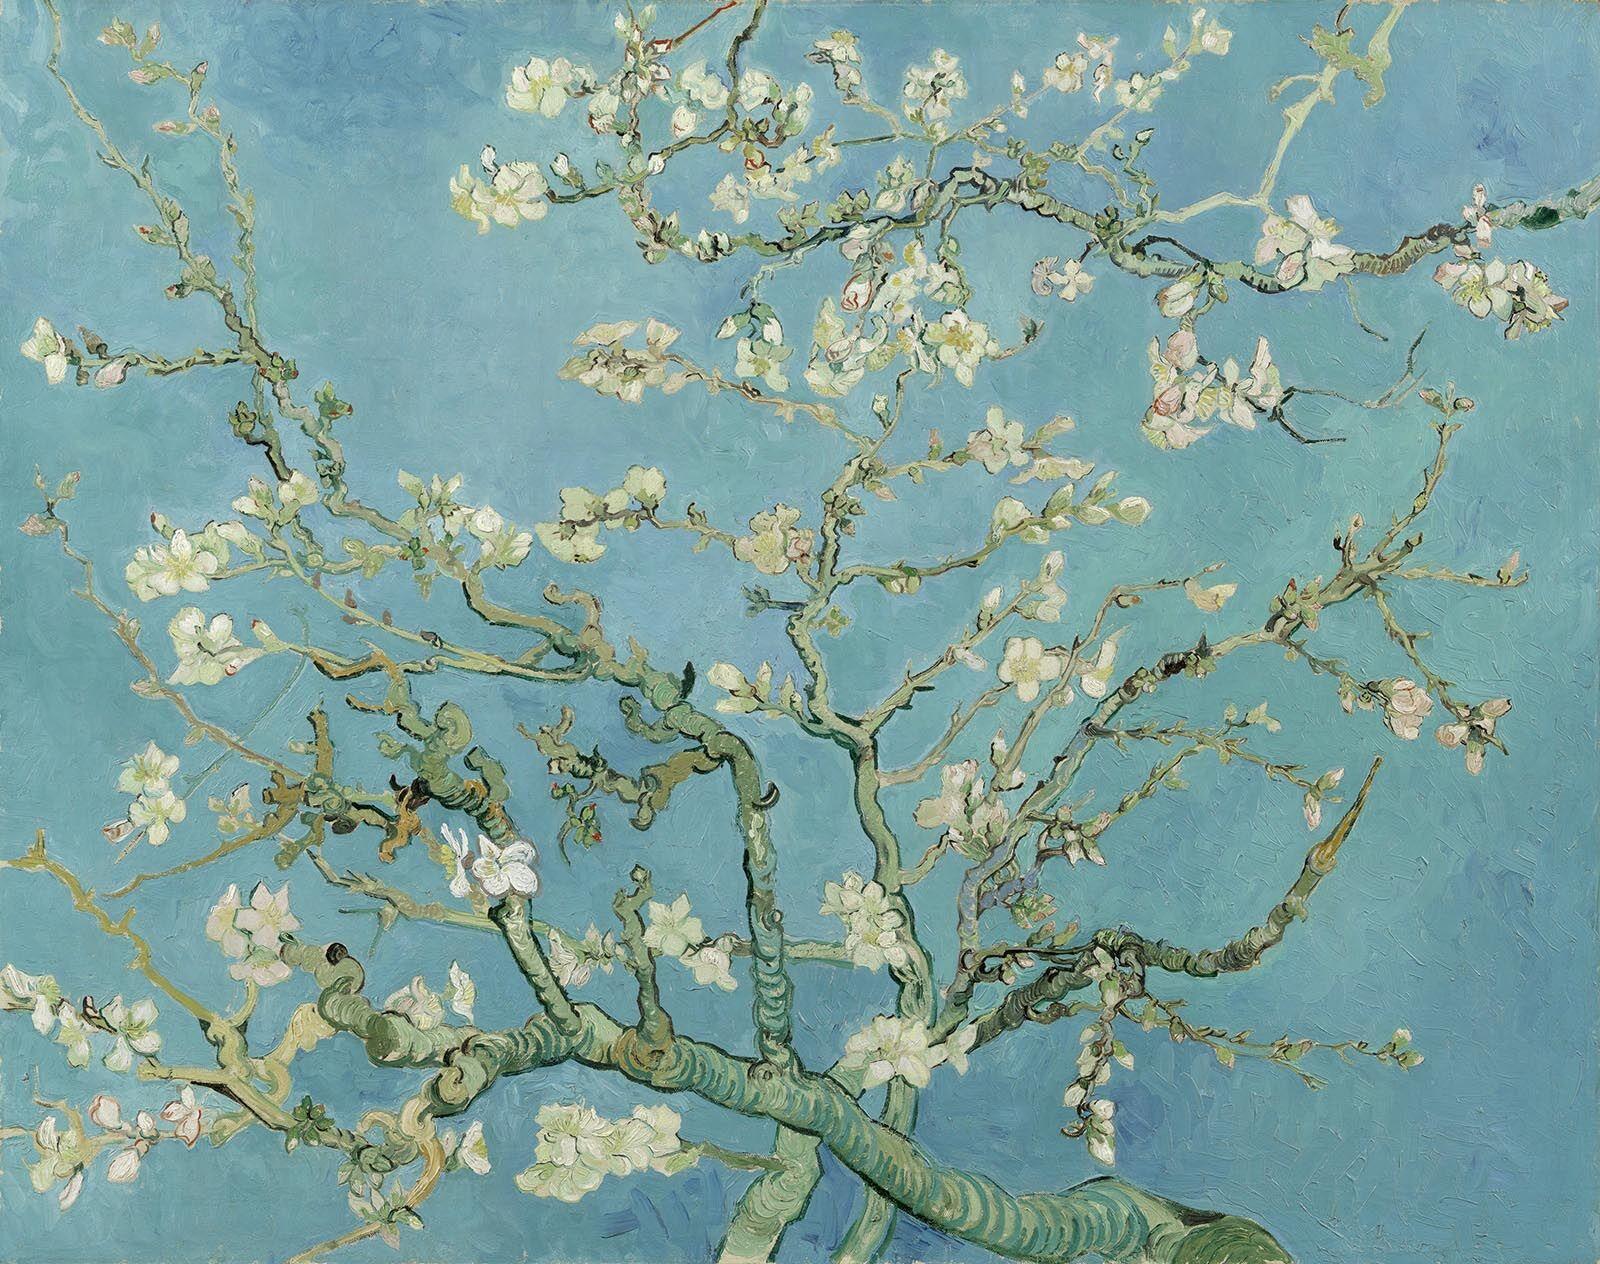 Vincent Van Goh, Almond Blossoms, 1890, Van Goh Museum